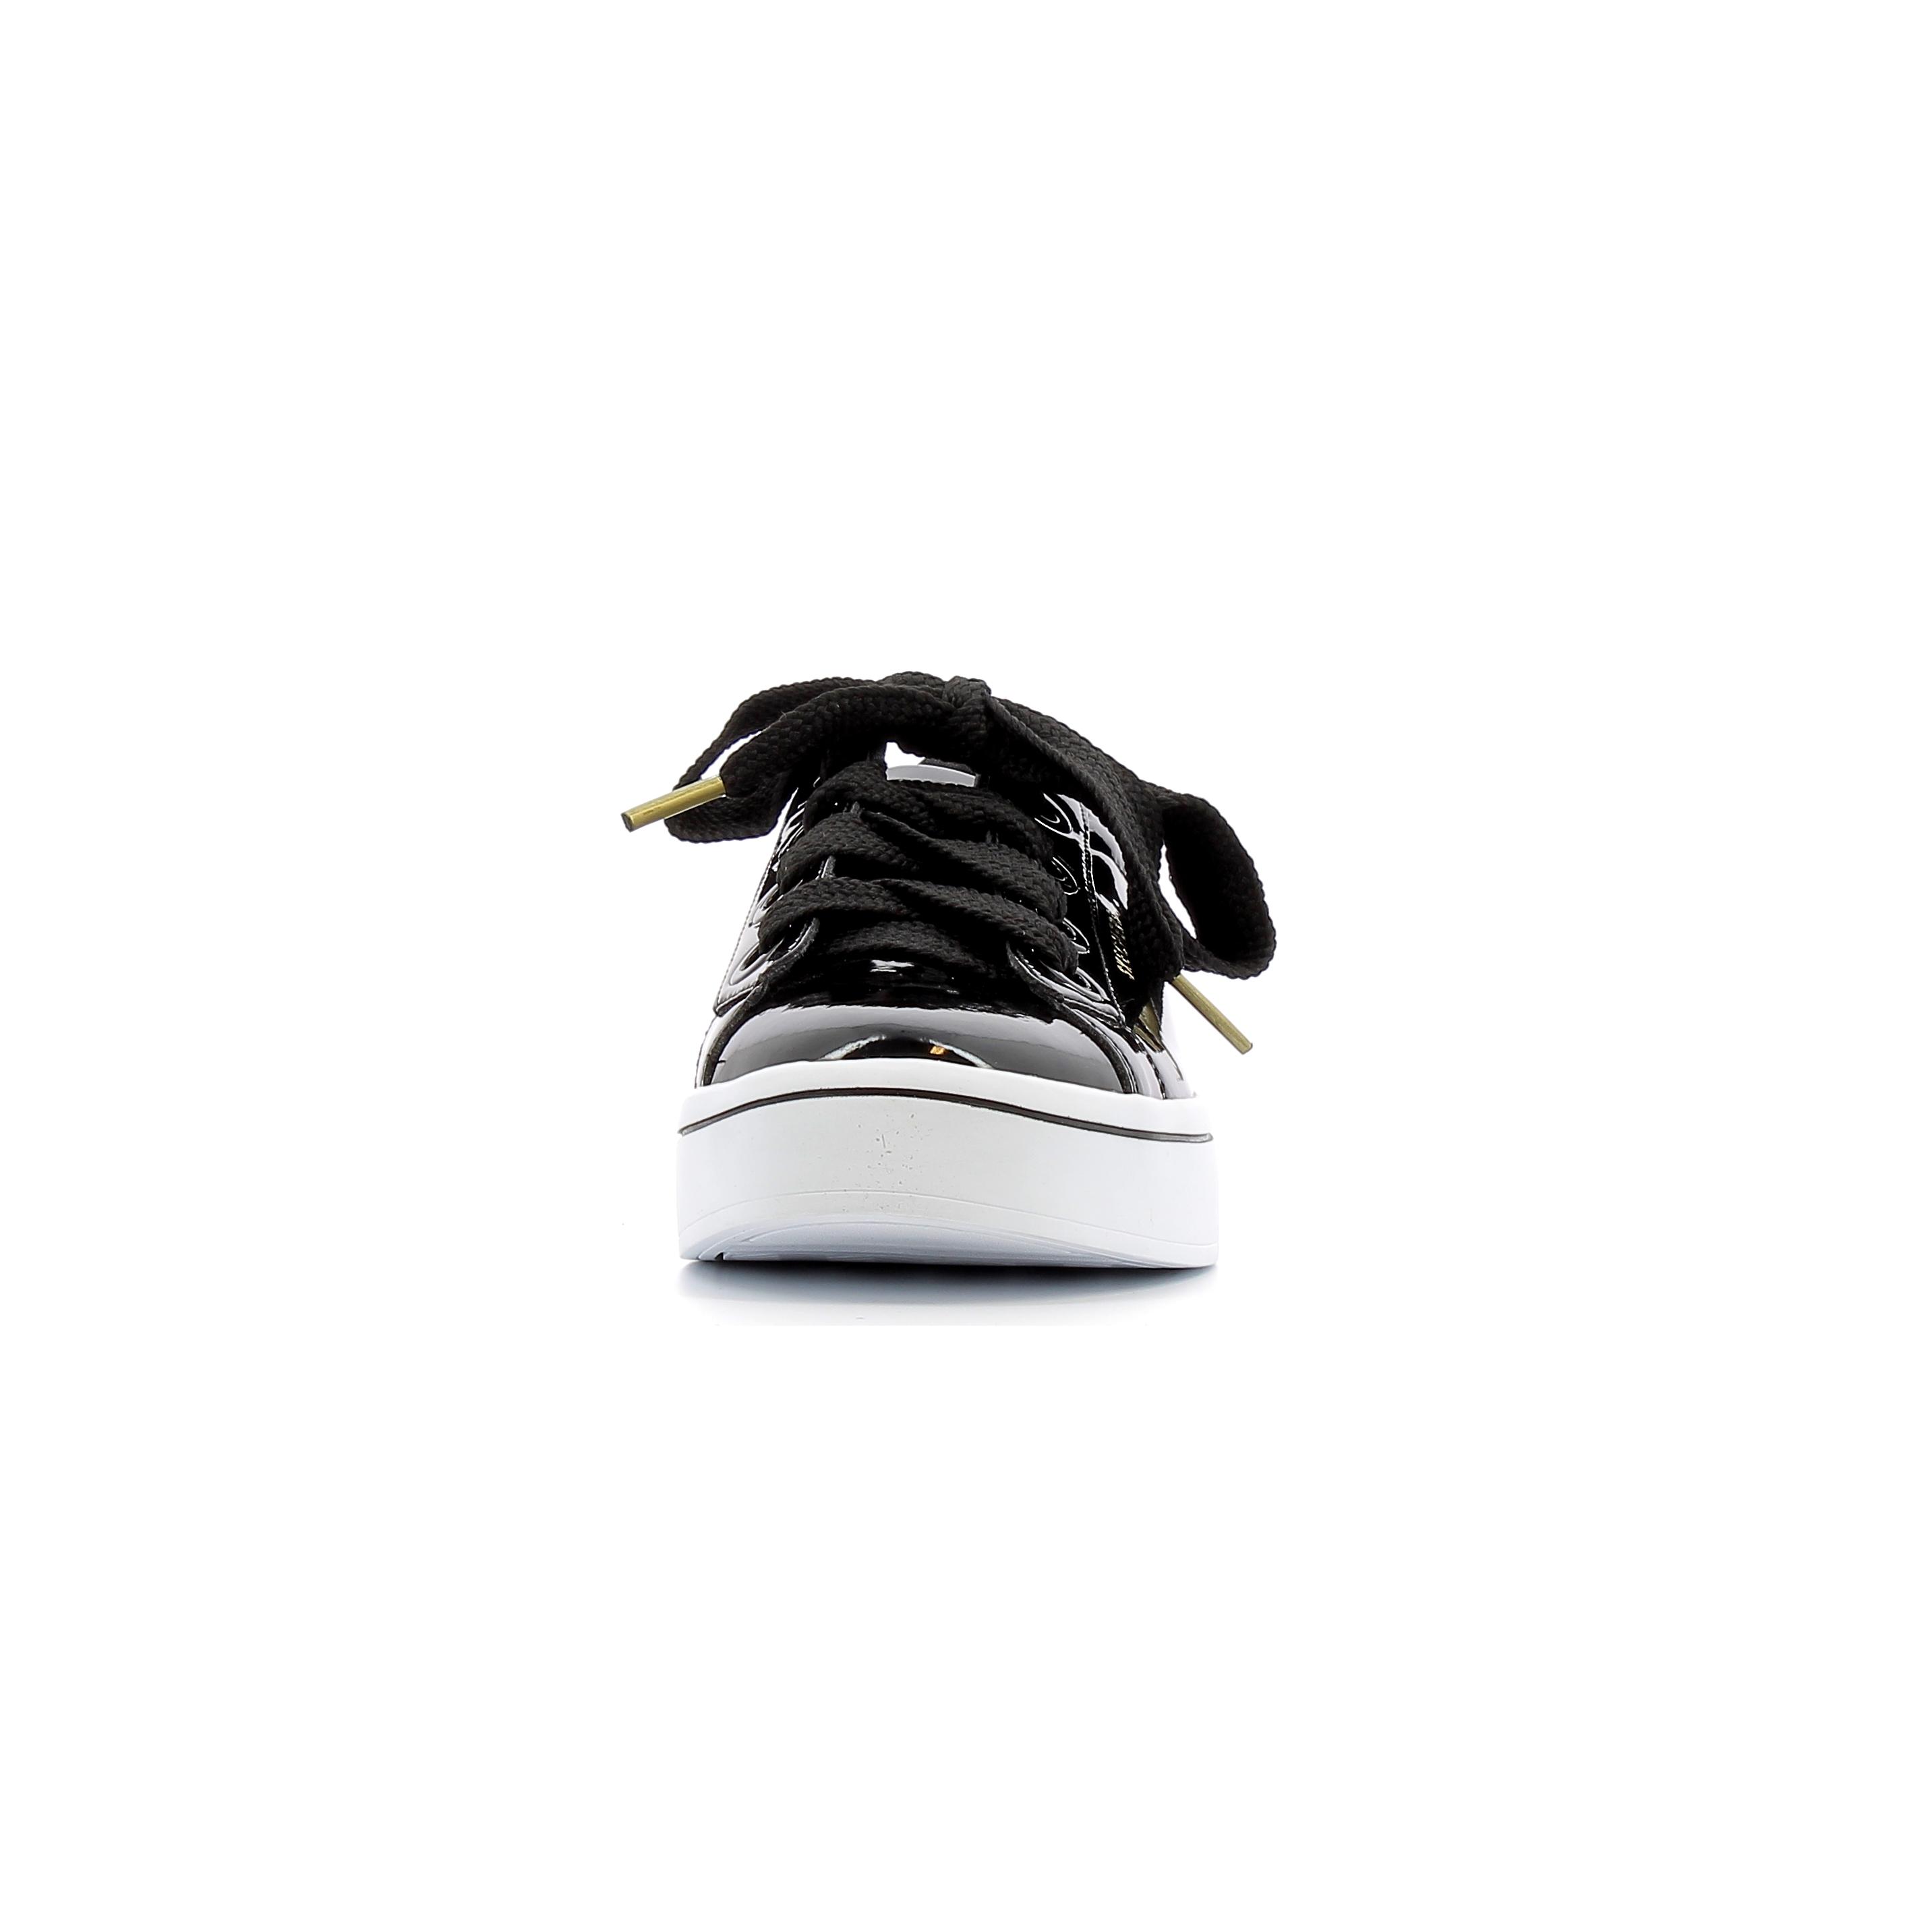 Shoes Basses Lites Hi Skechers Cabello Baskets Slick dqwXdS